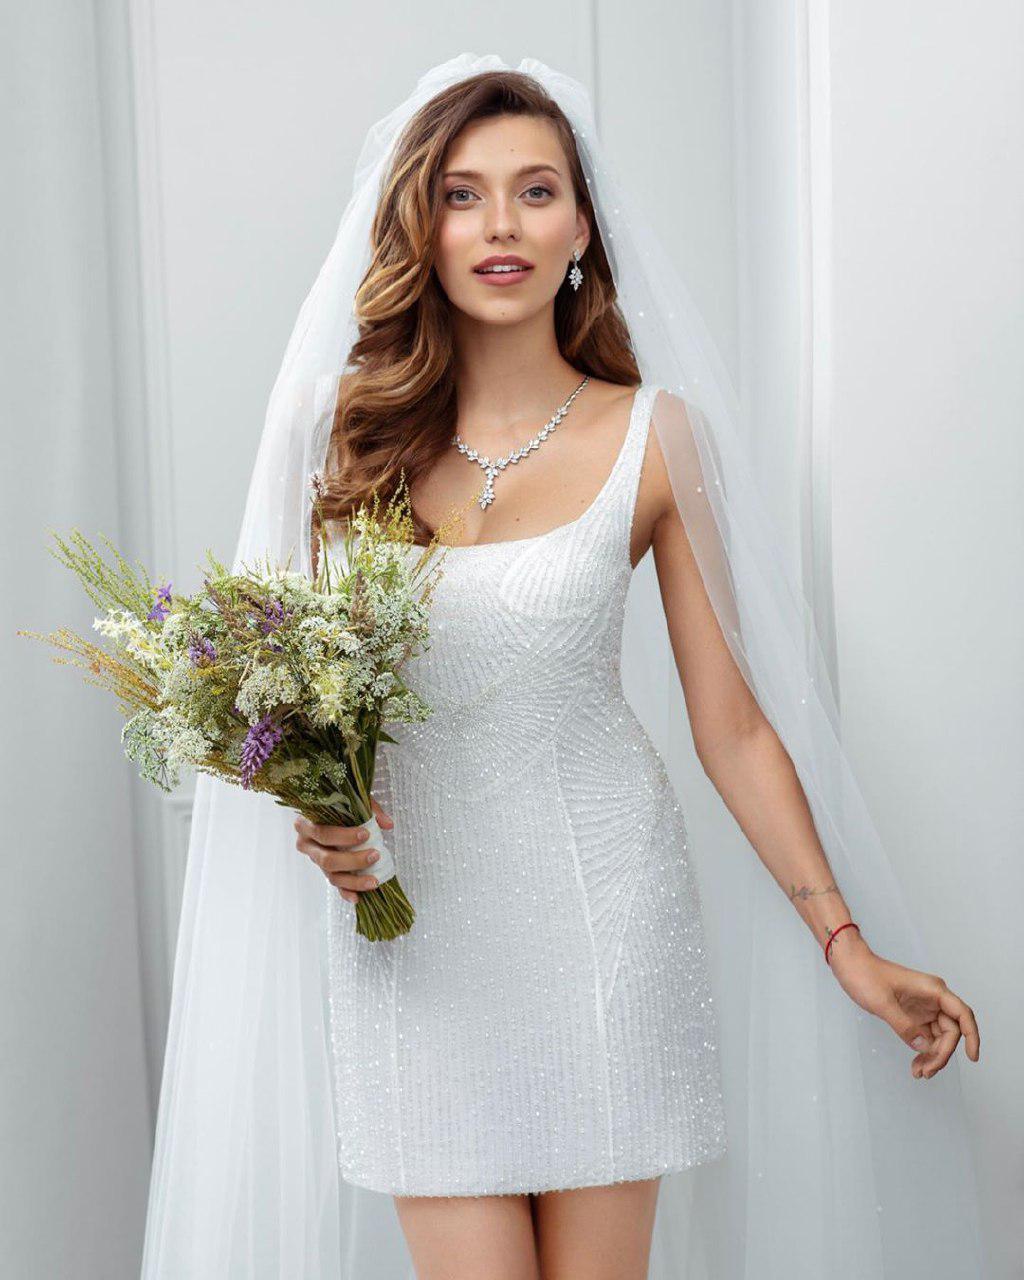 Тодоренко вмини-платье ифате